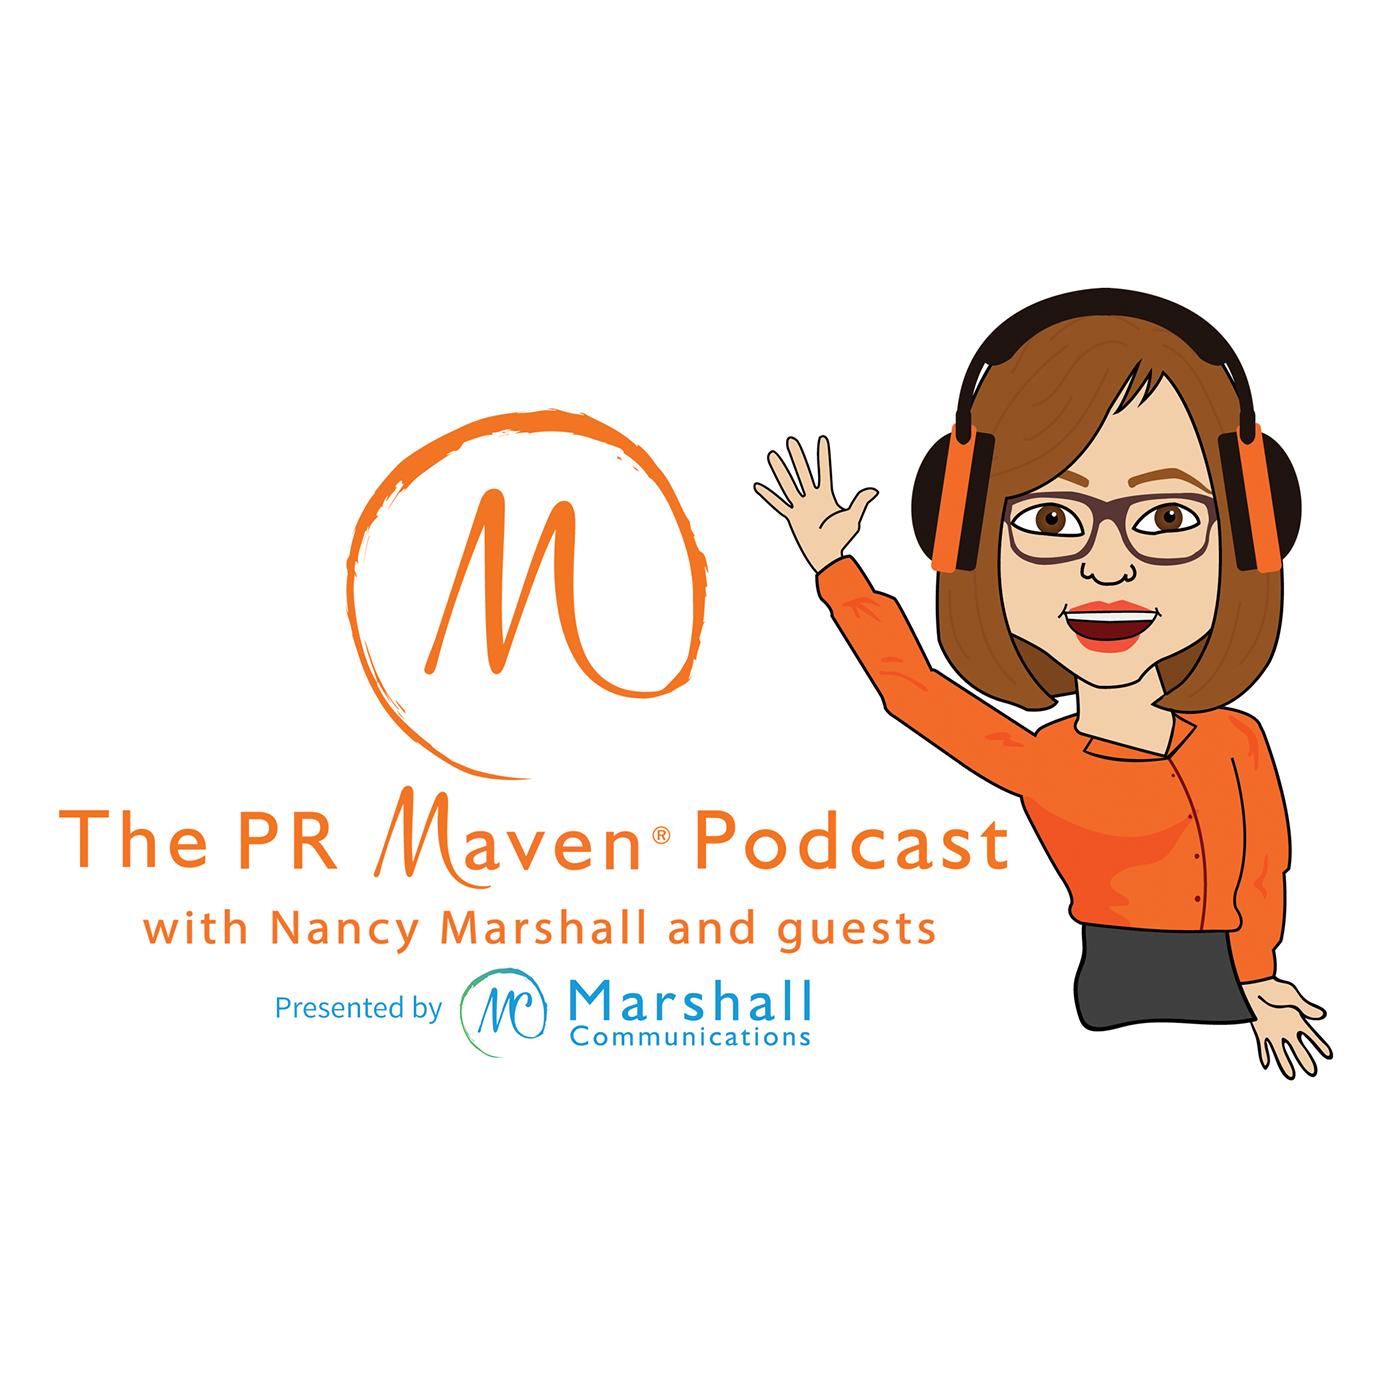 The PR Maven Podcast